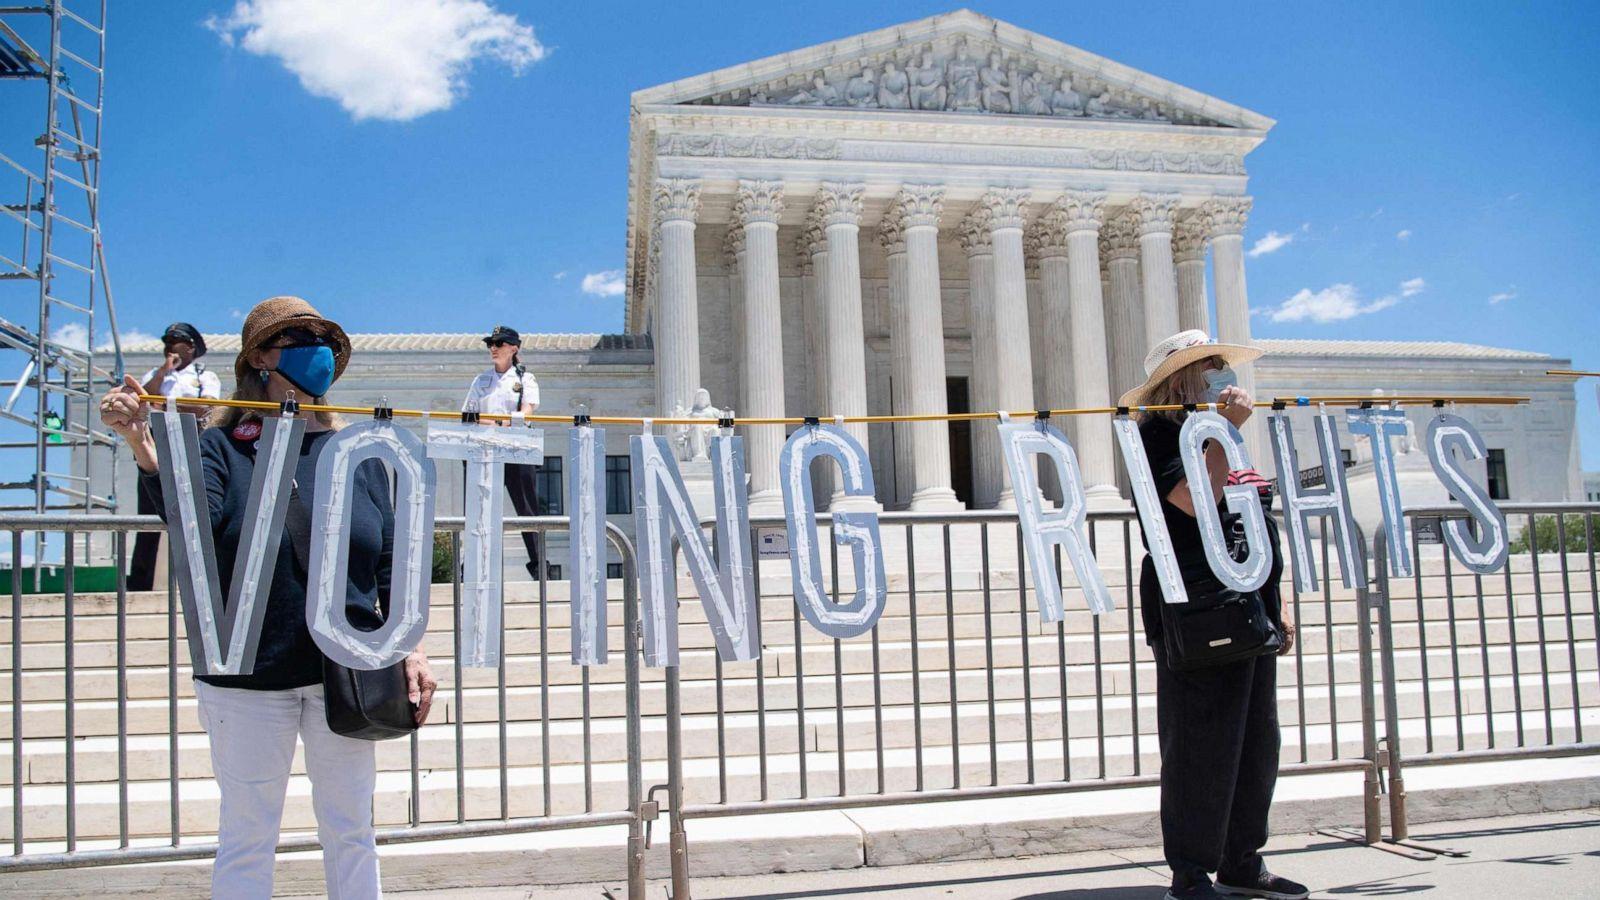 voting-rights-SCOTUS-ge_hpMain_20210623-165217_16x9_1600